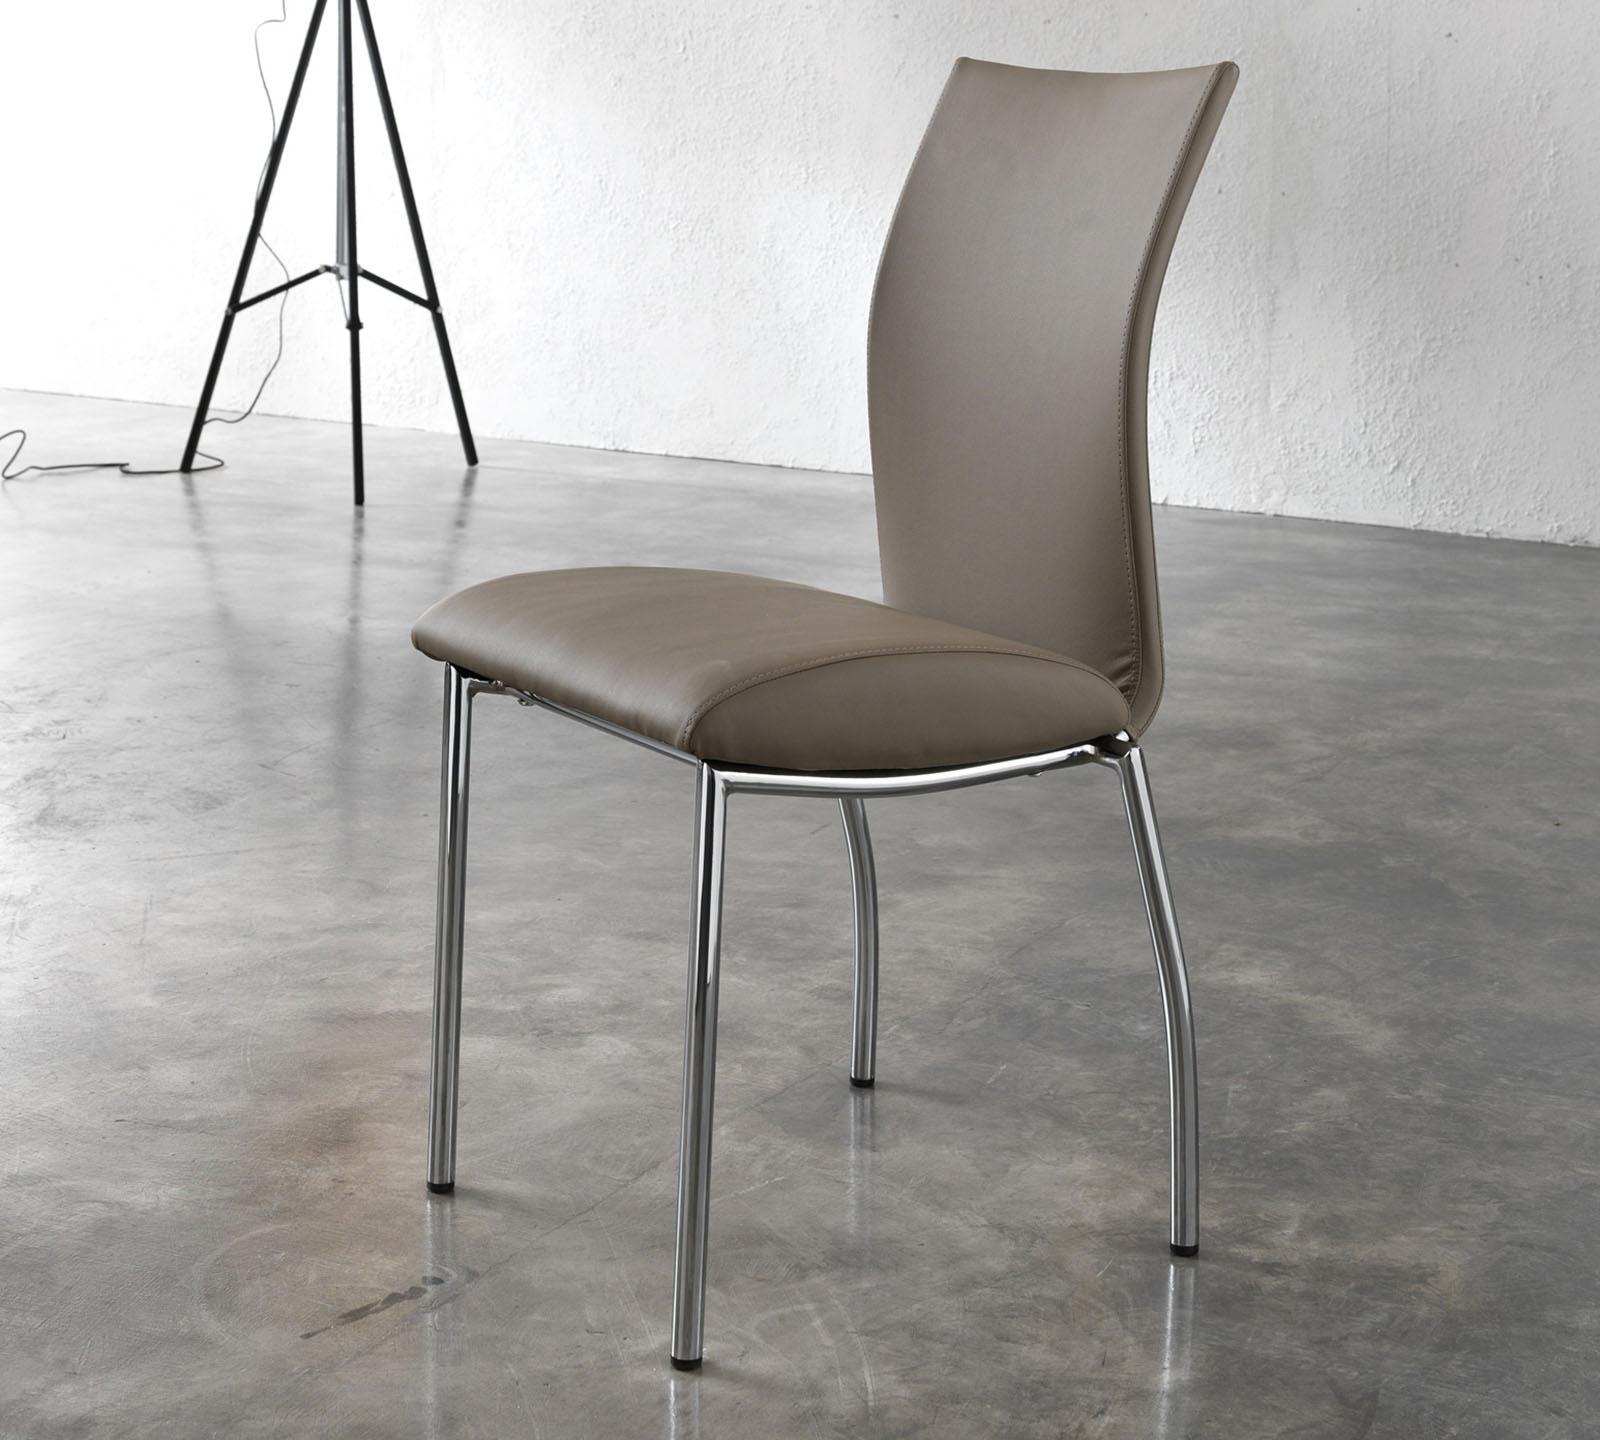 Stunning Sedie In Ecopelle Ideas - Design and Ideas - novosibirsk.us